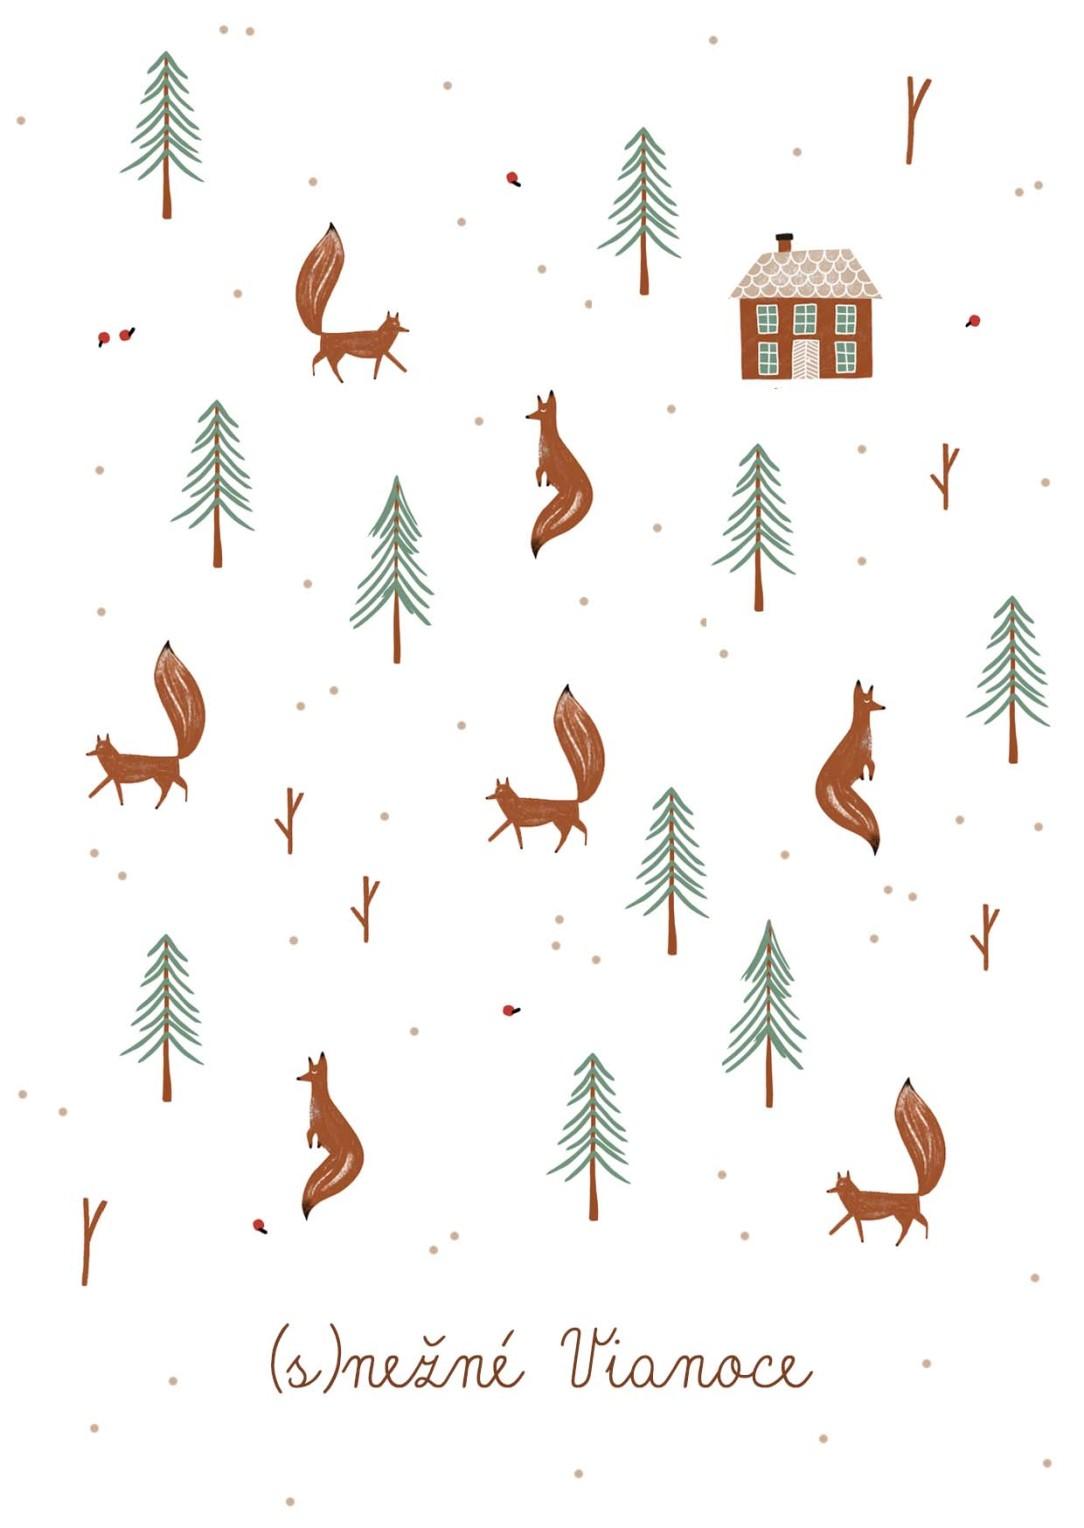 snezne vianoce.jpg